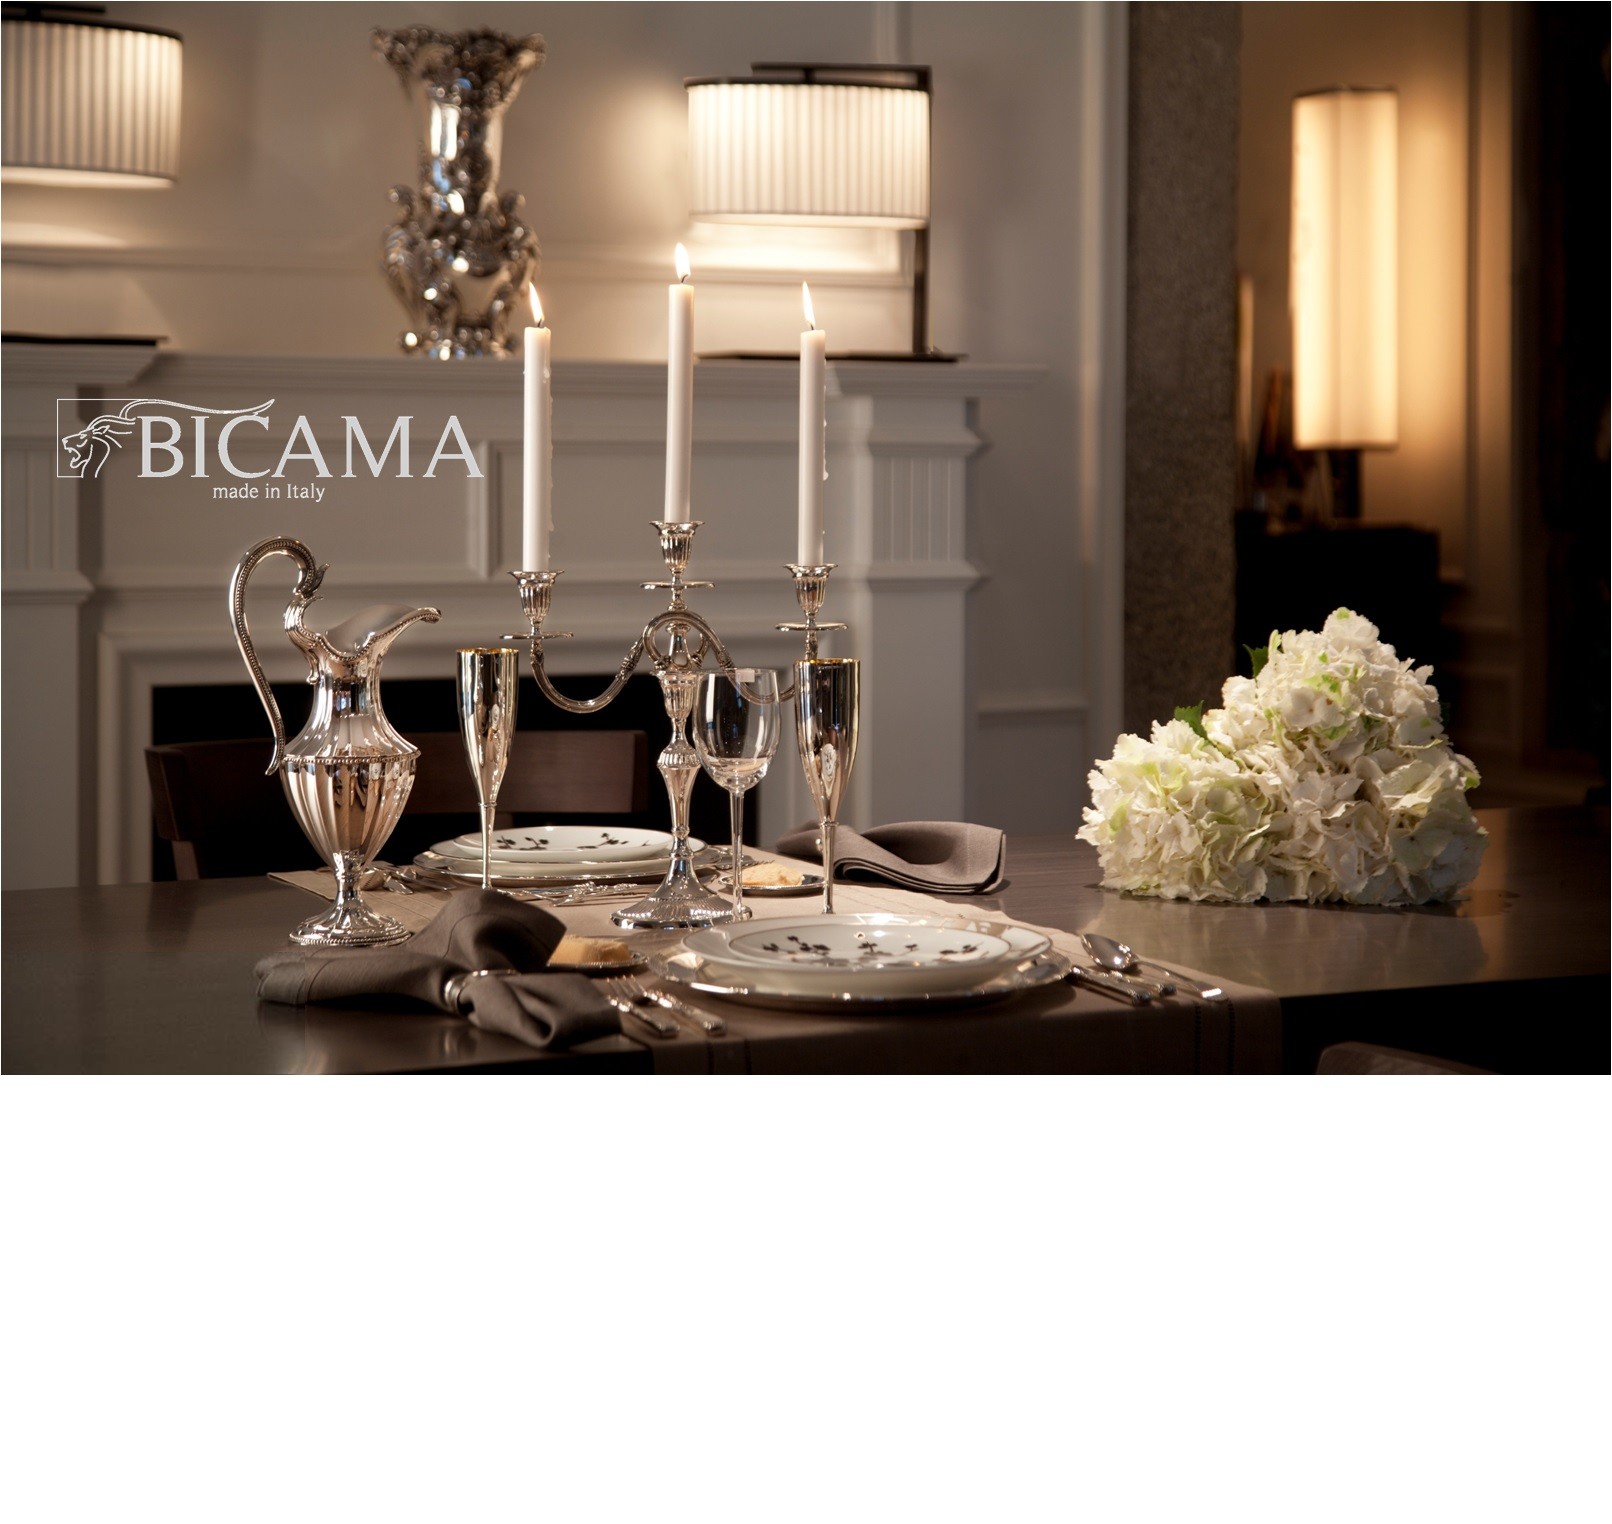 Bicama Fine Tabletop Collection